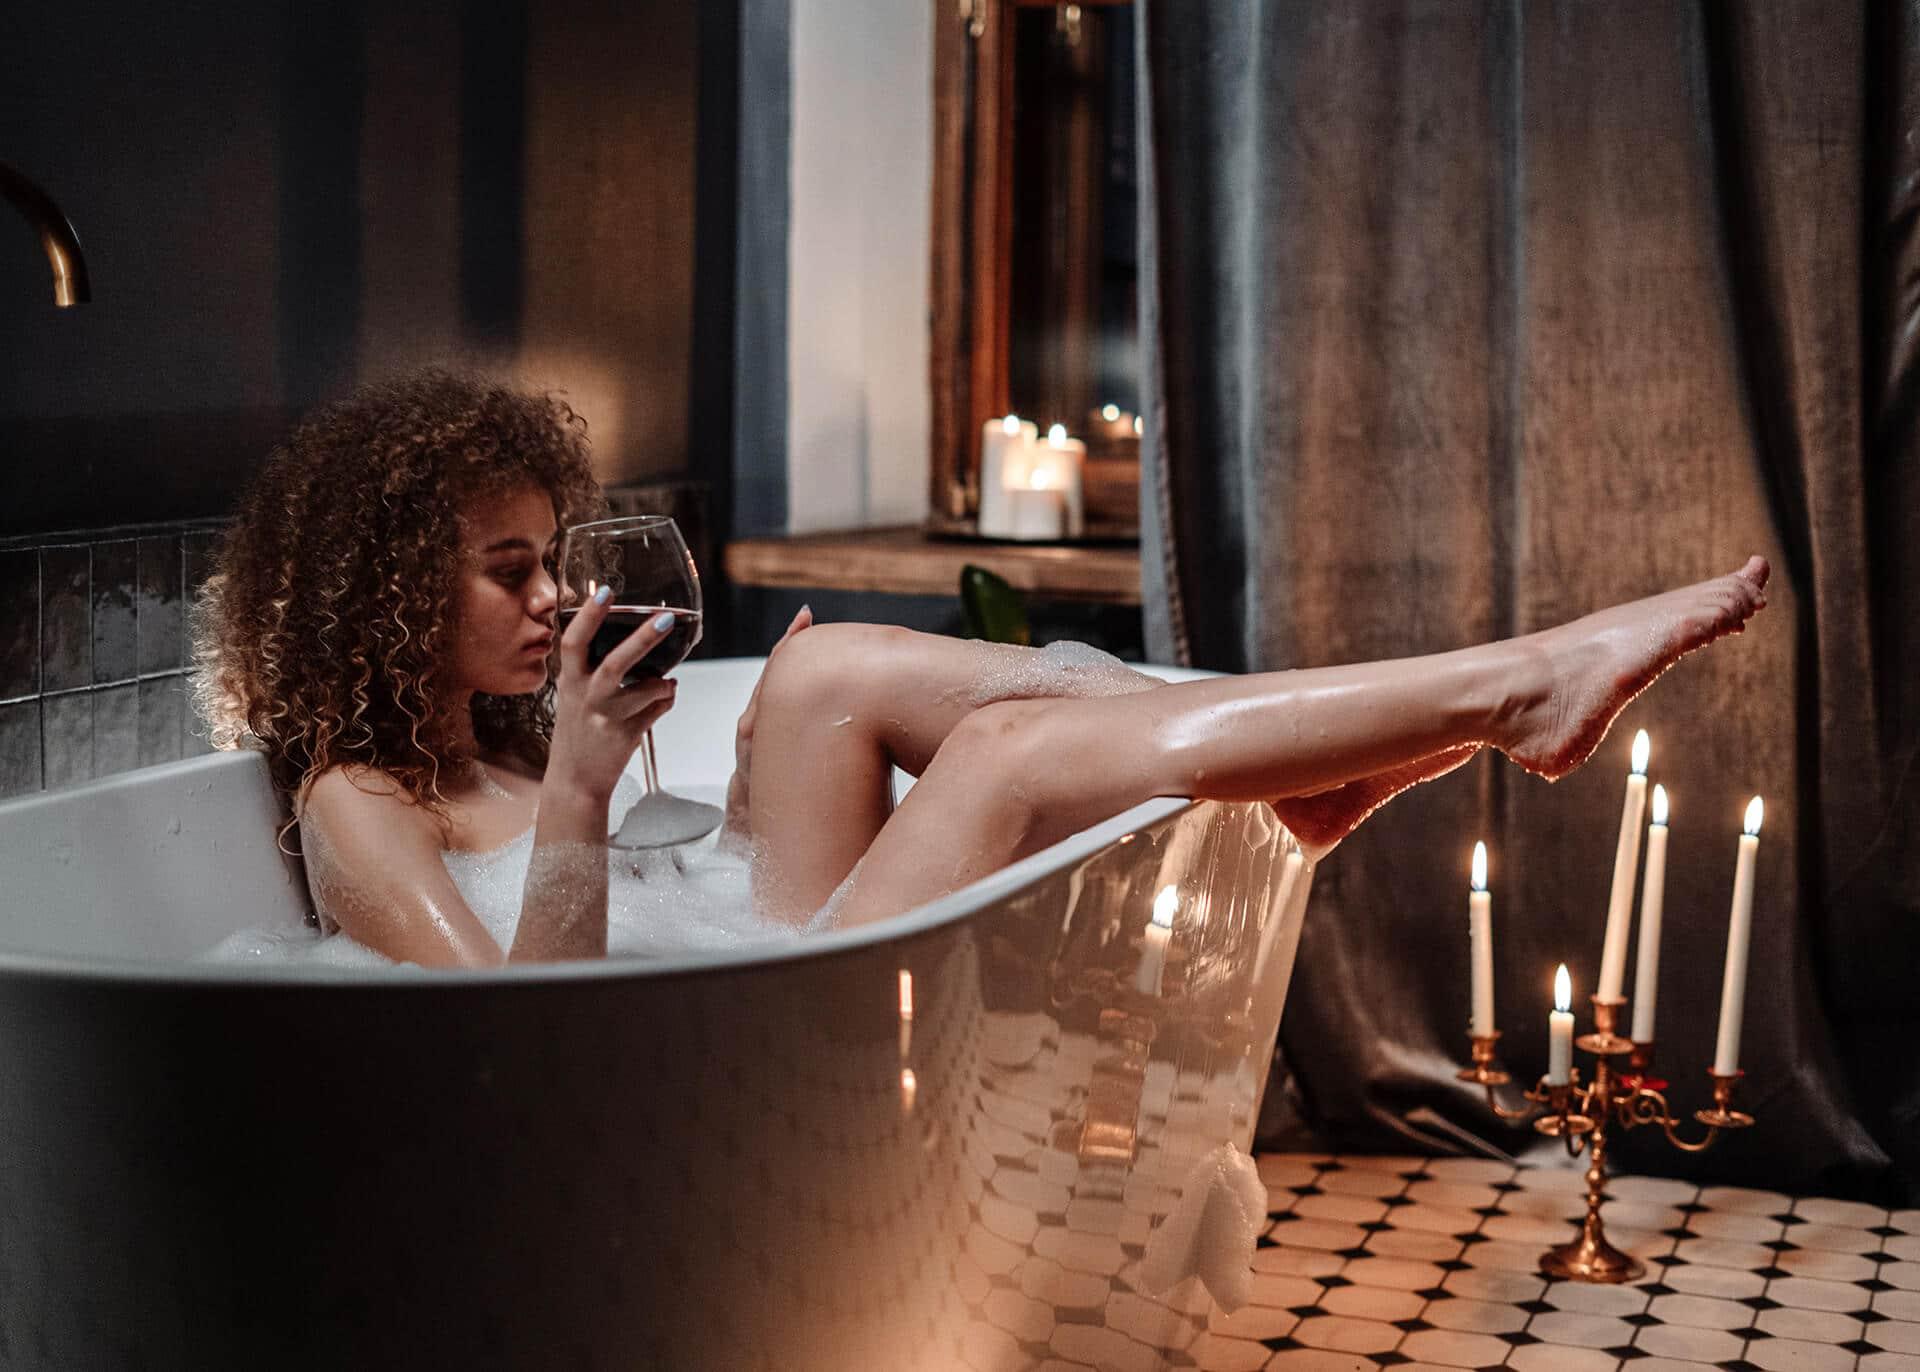 woman in bathtub holding wine glass